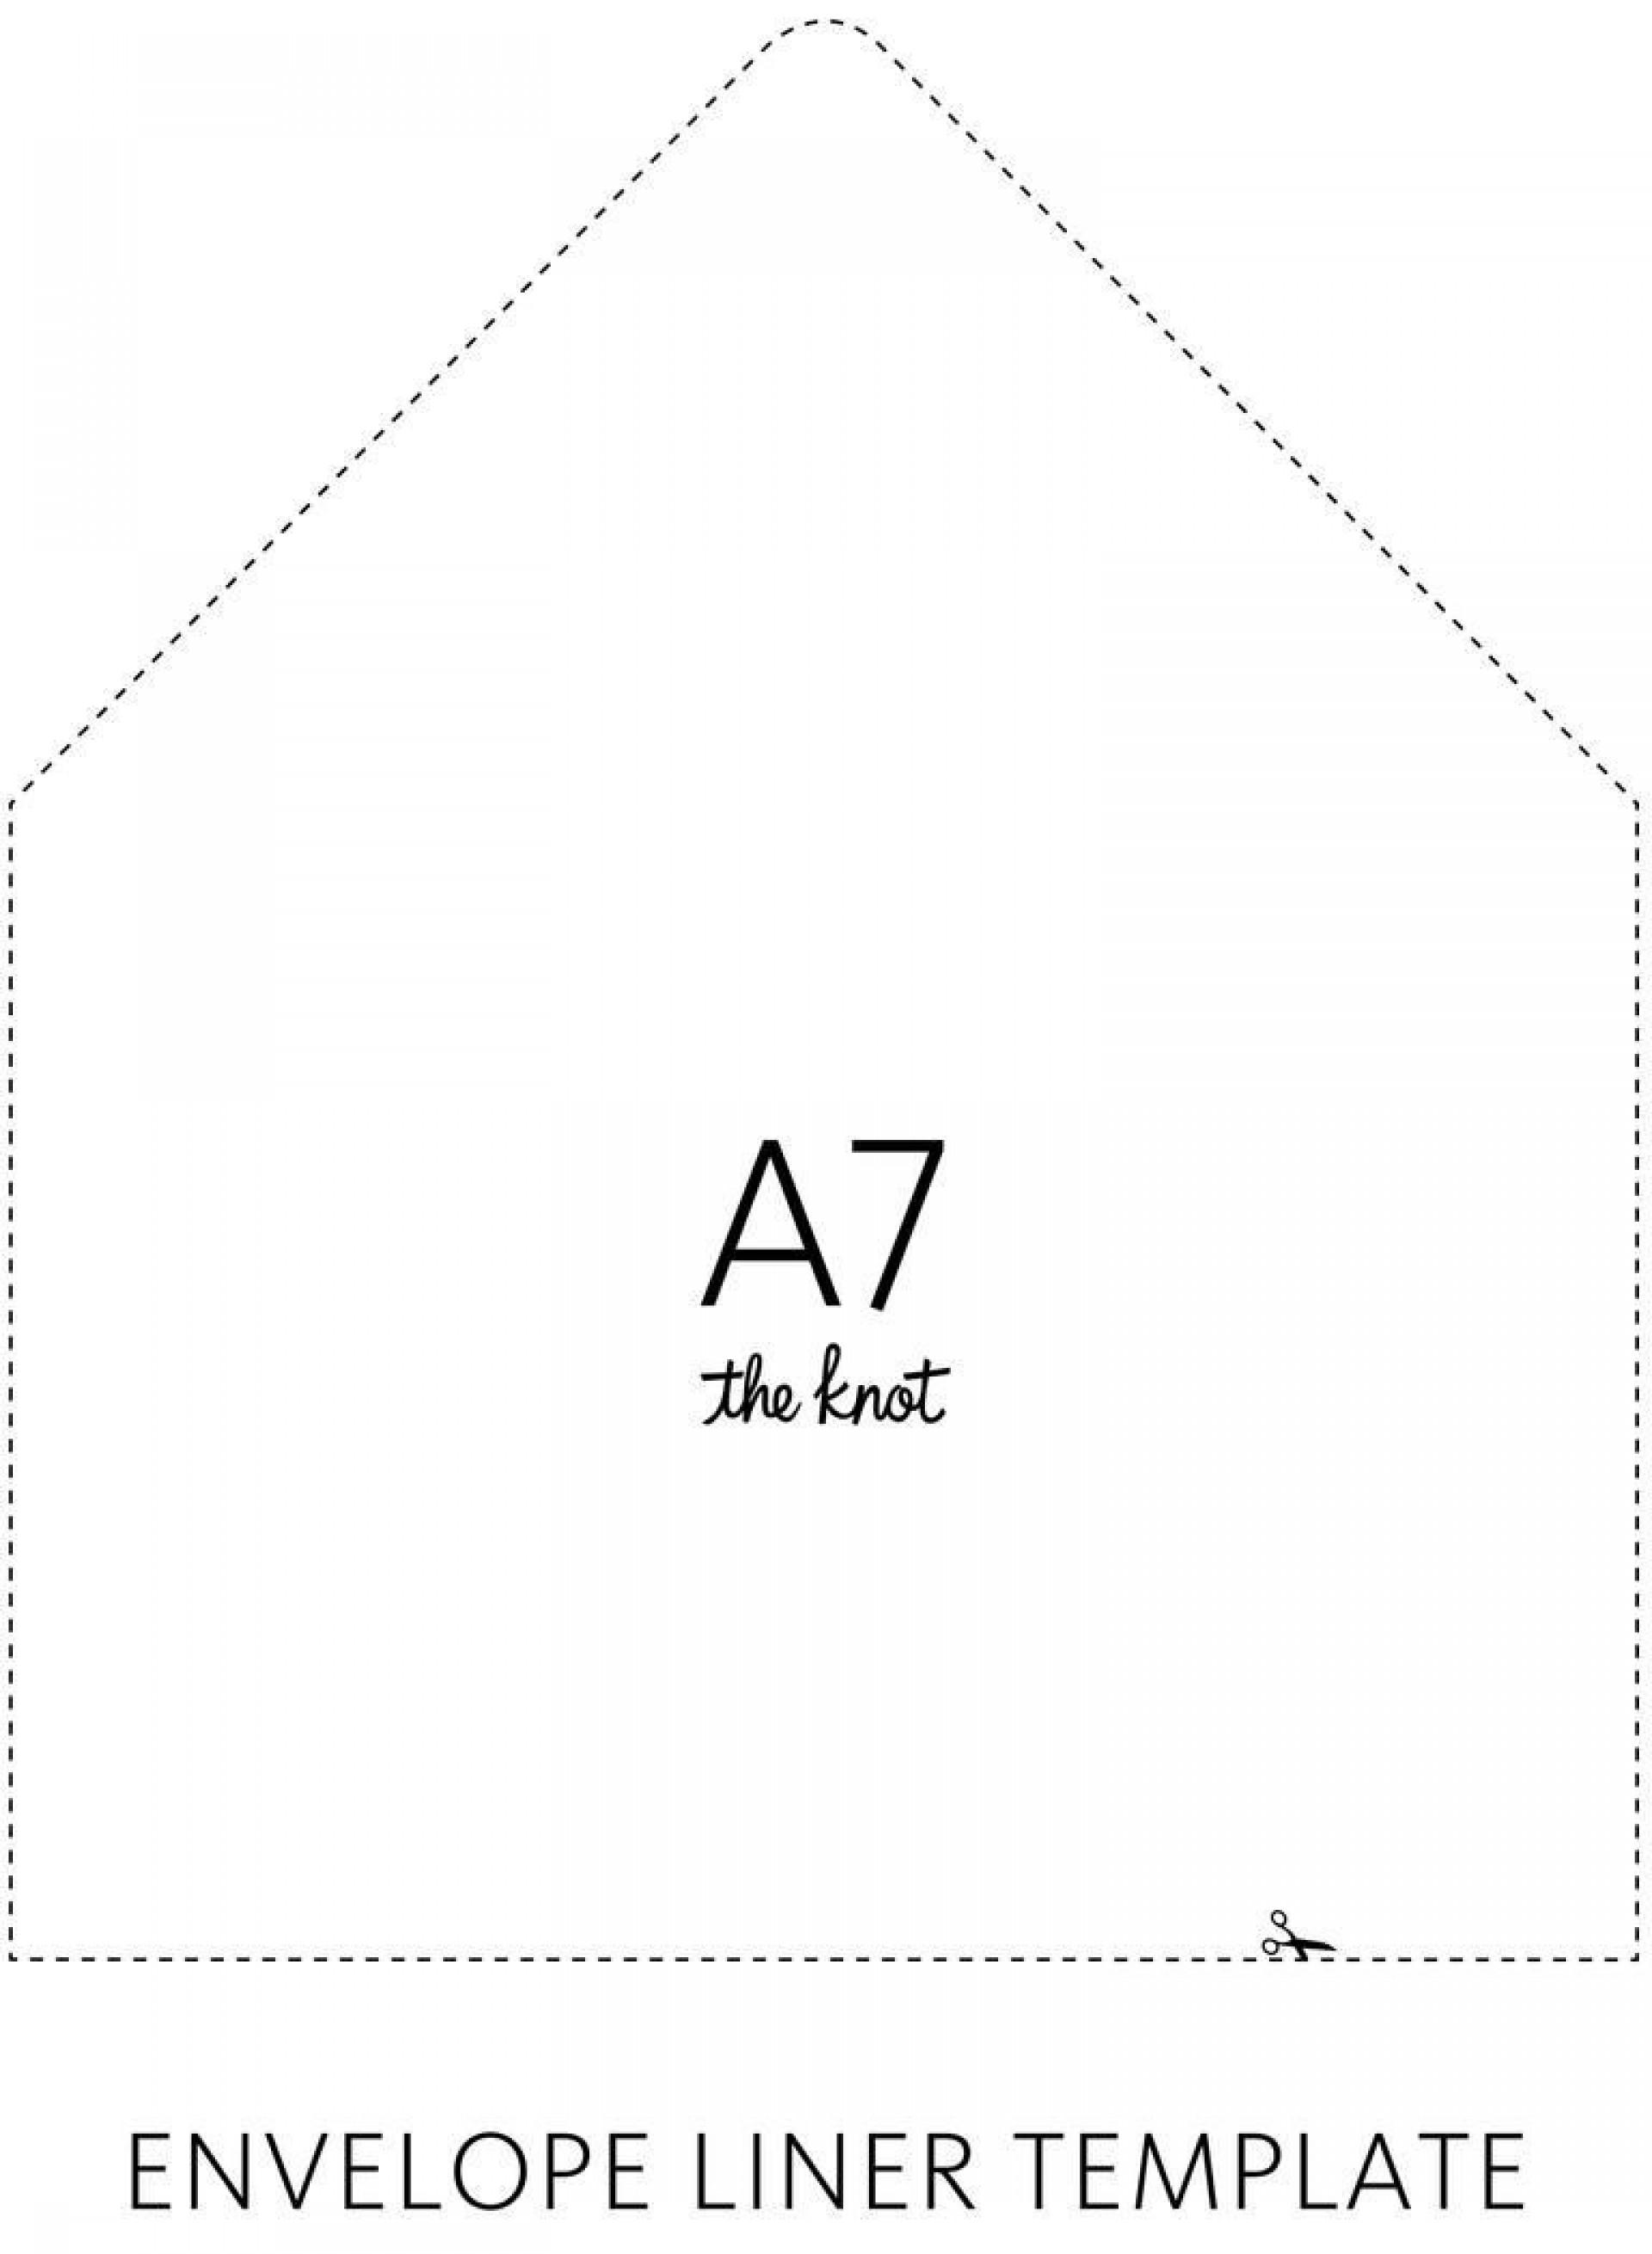 002 Marvelou A7 Envelope Liner Template Square Flap Inspiration 1920